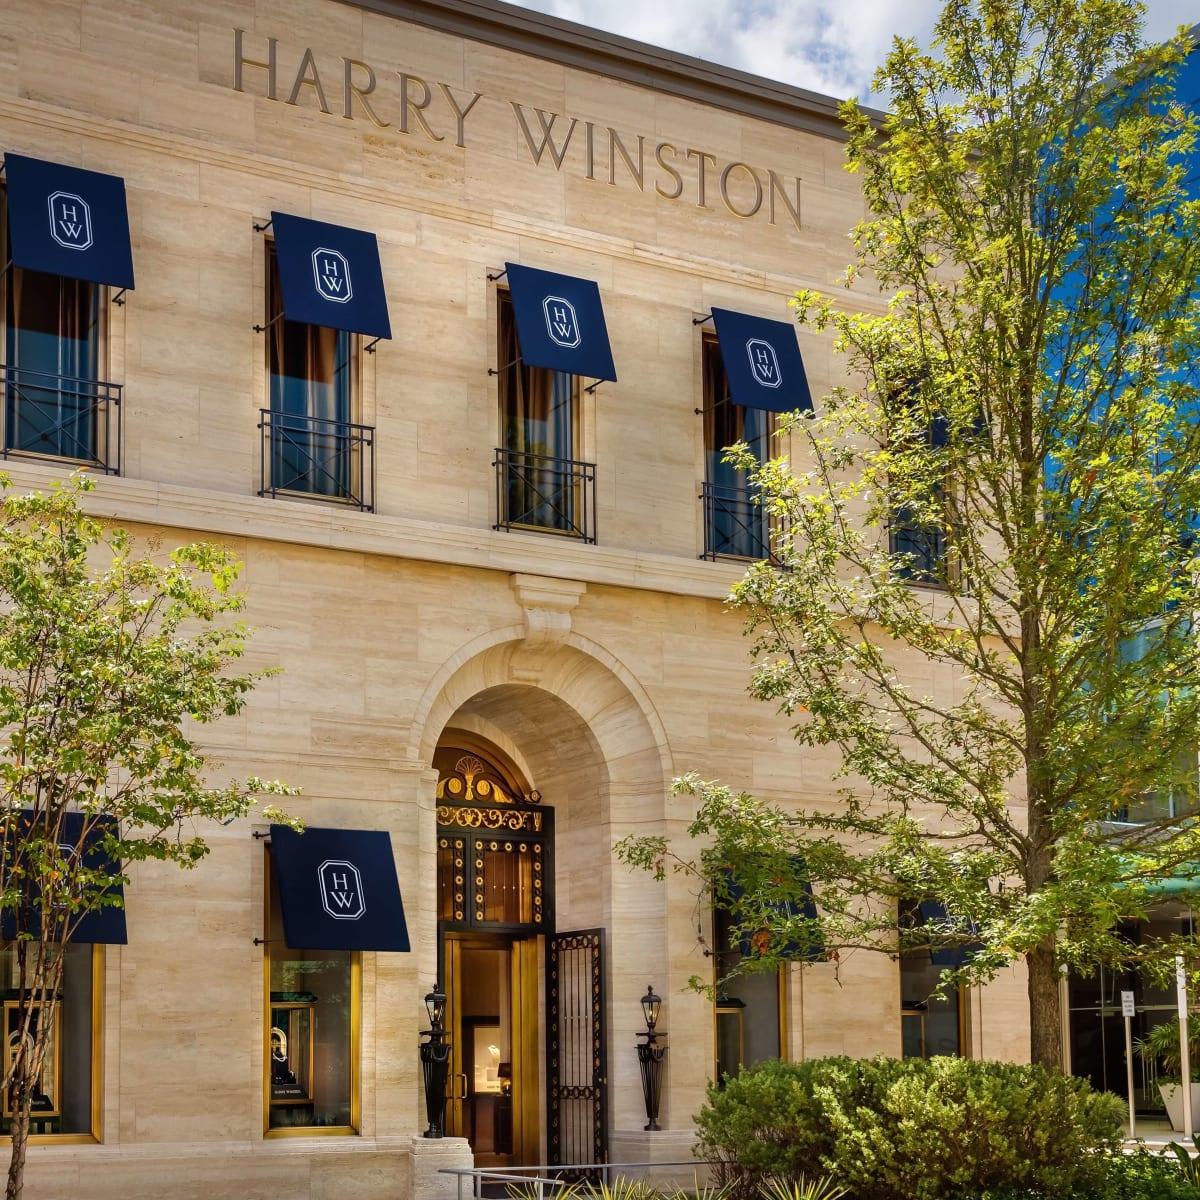 Harry Winston Houston July 2016